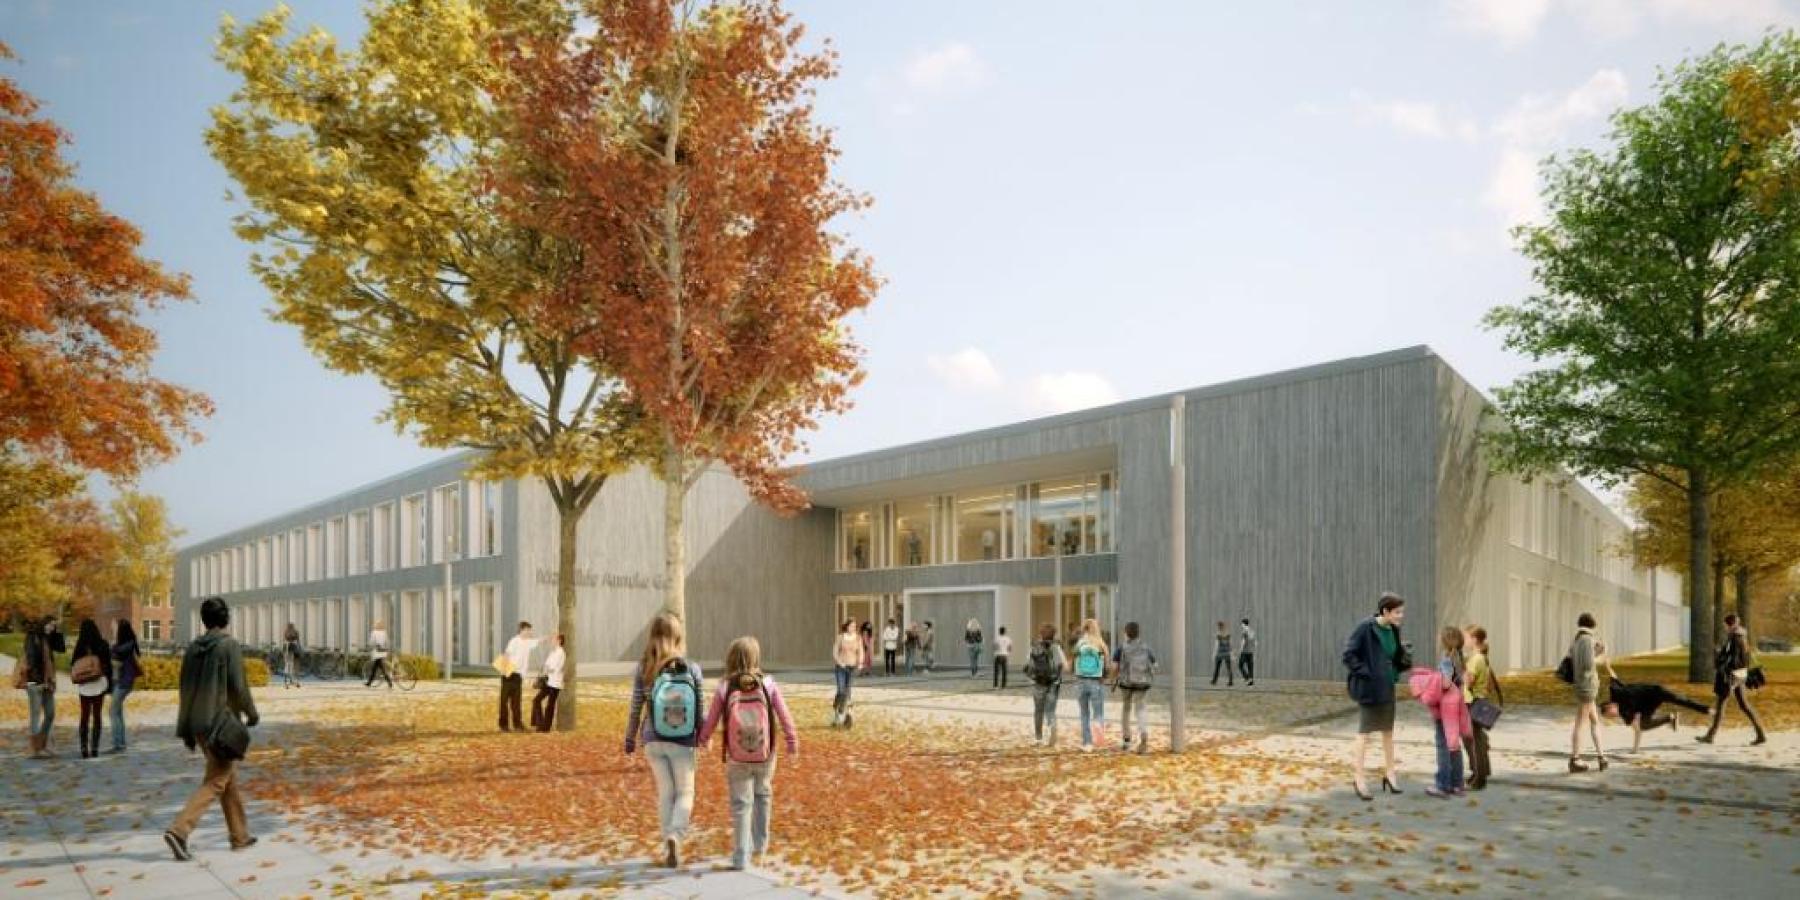 Münsters größtes Schulprojekt im Stadtportal